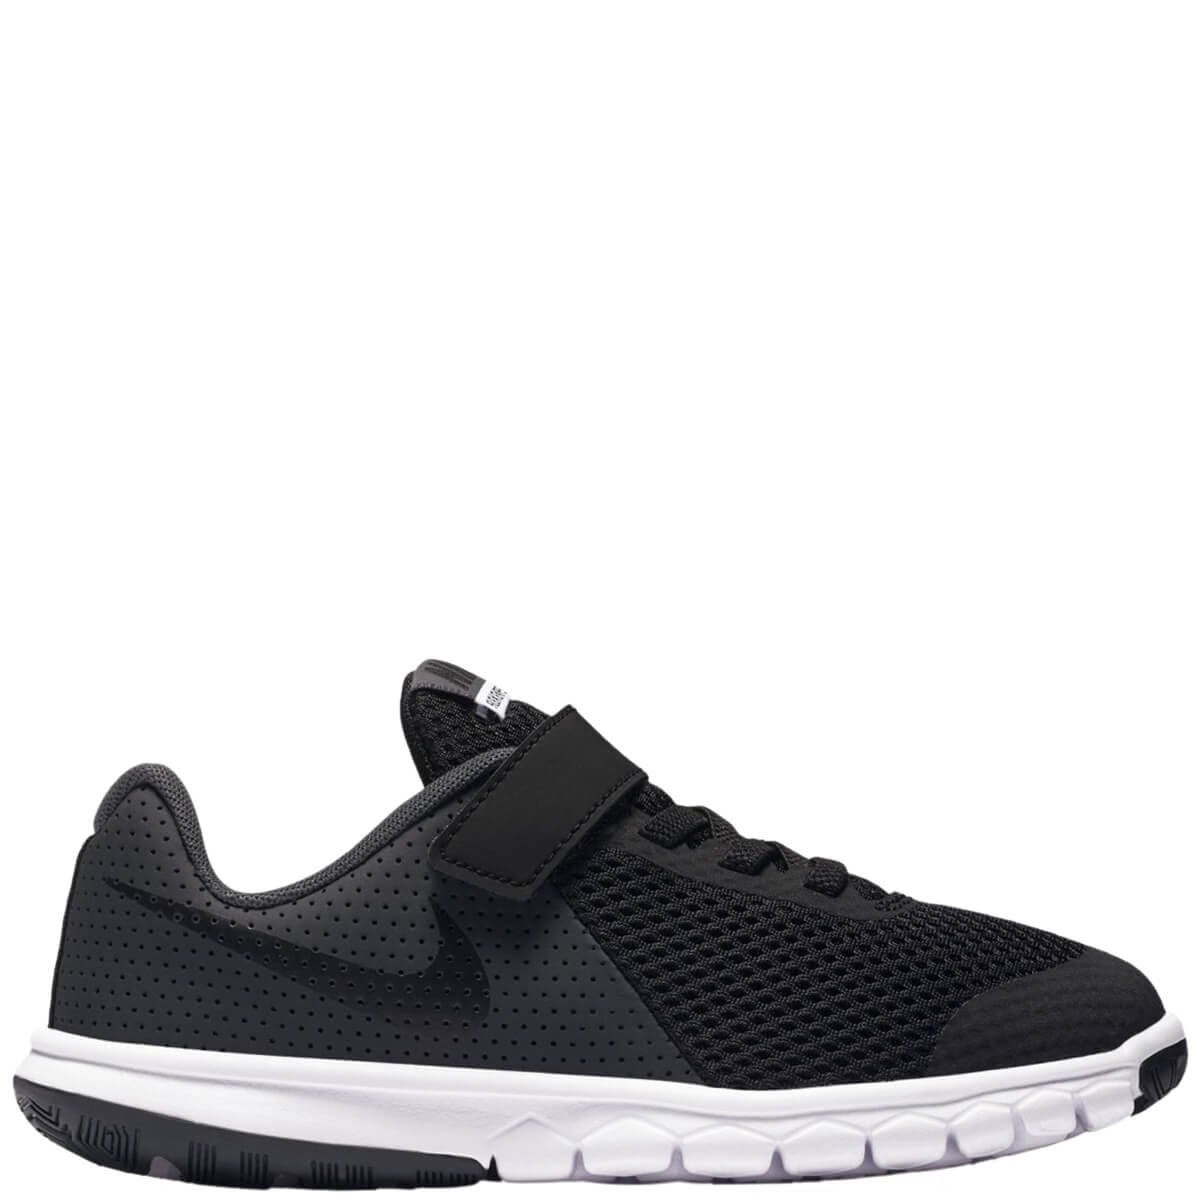 31acb5322d6 Bizz Store - Tênis Infantil Masculino Nike Flex Experience 5